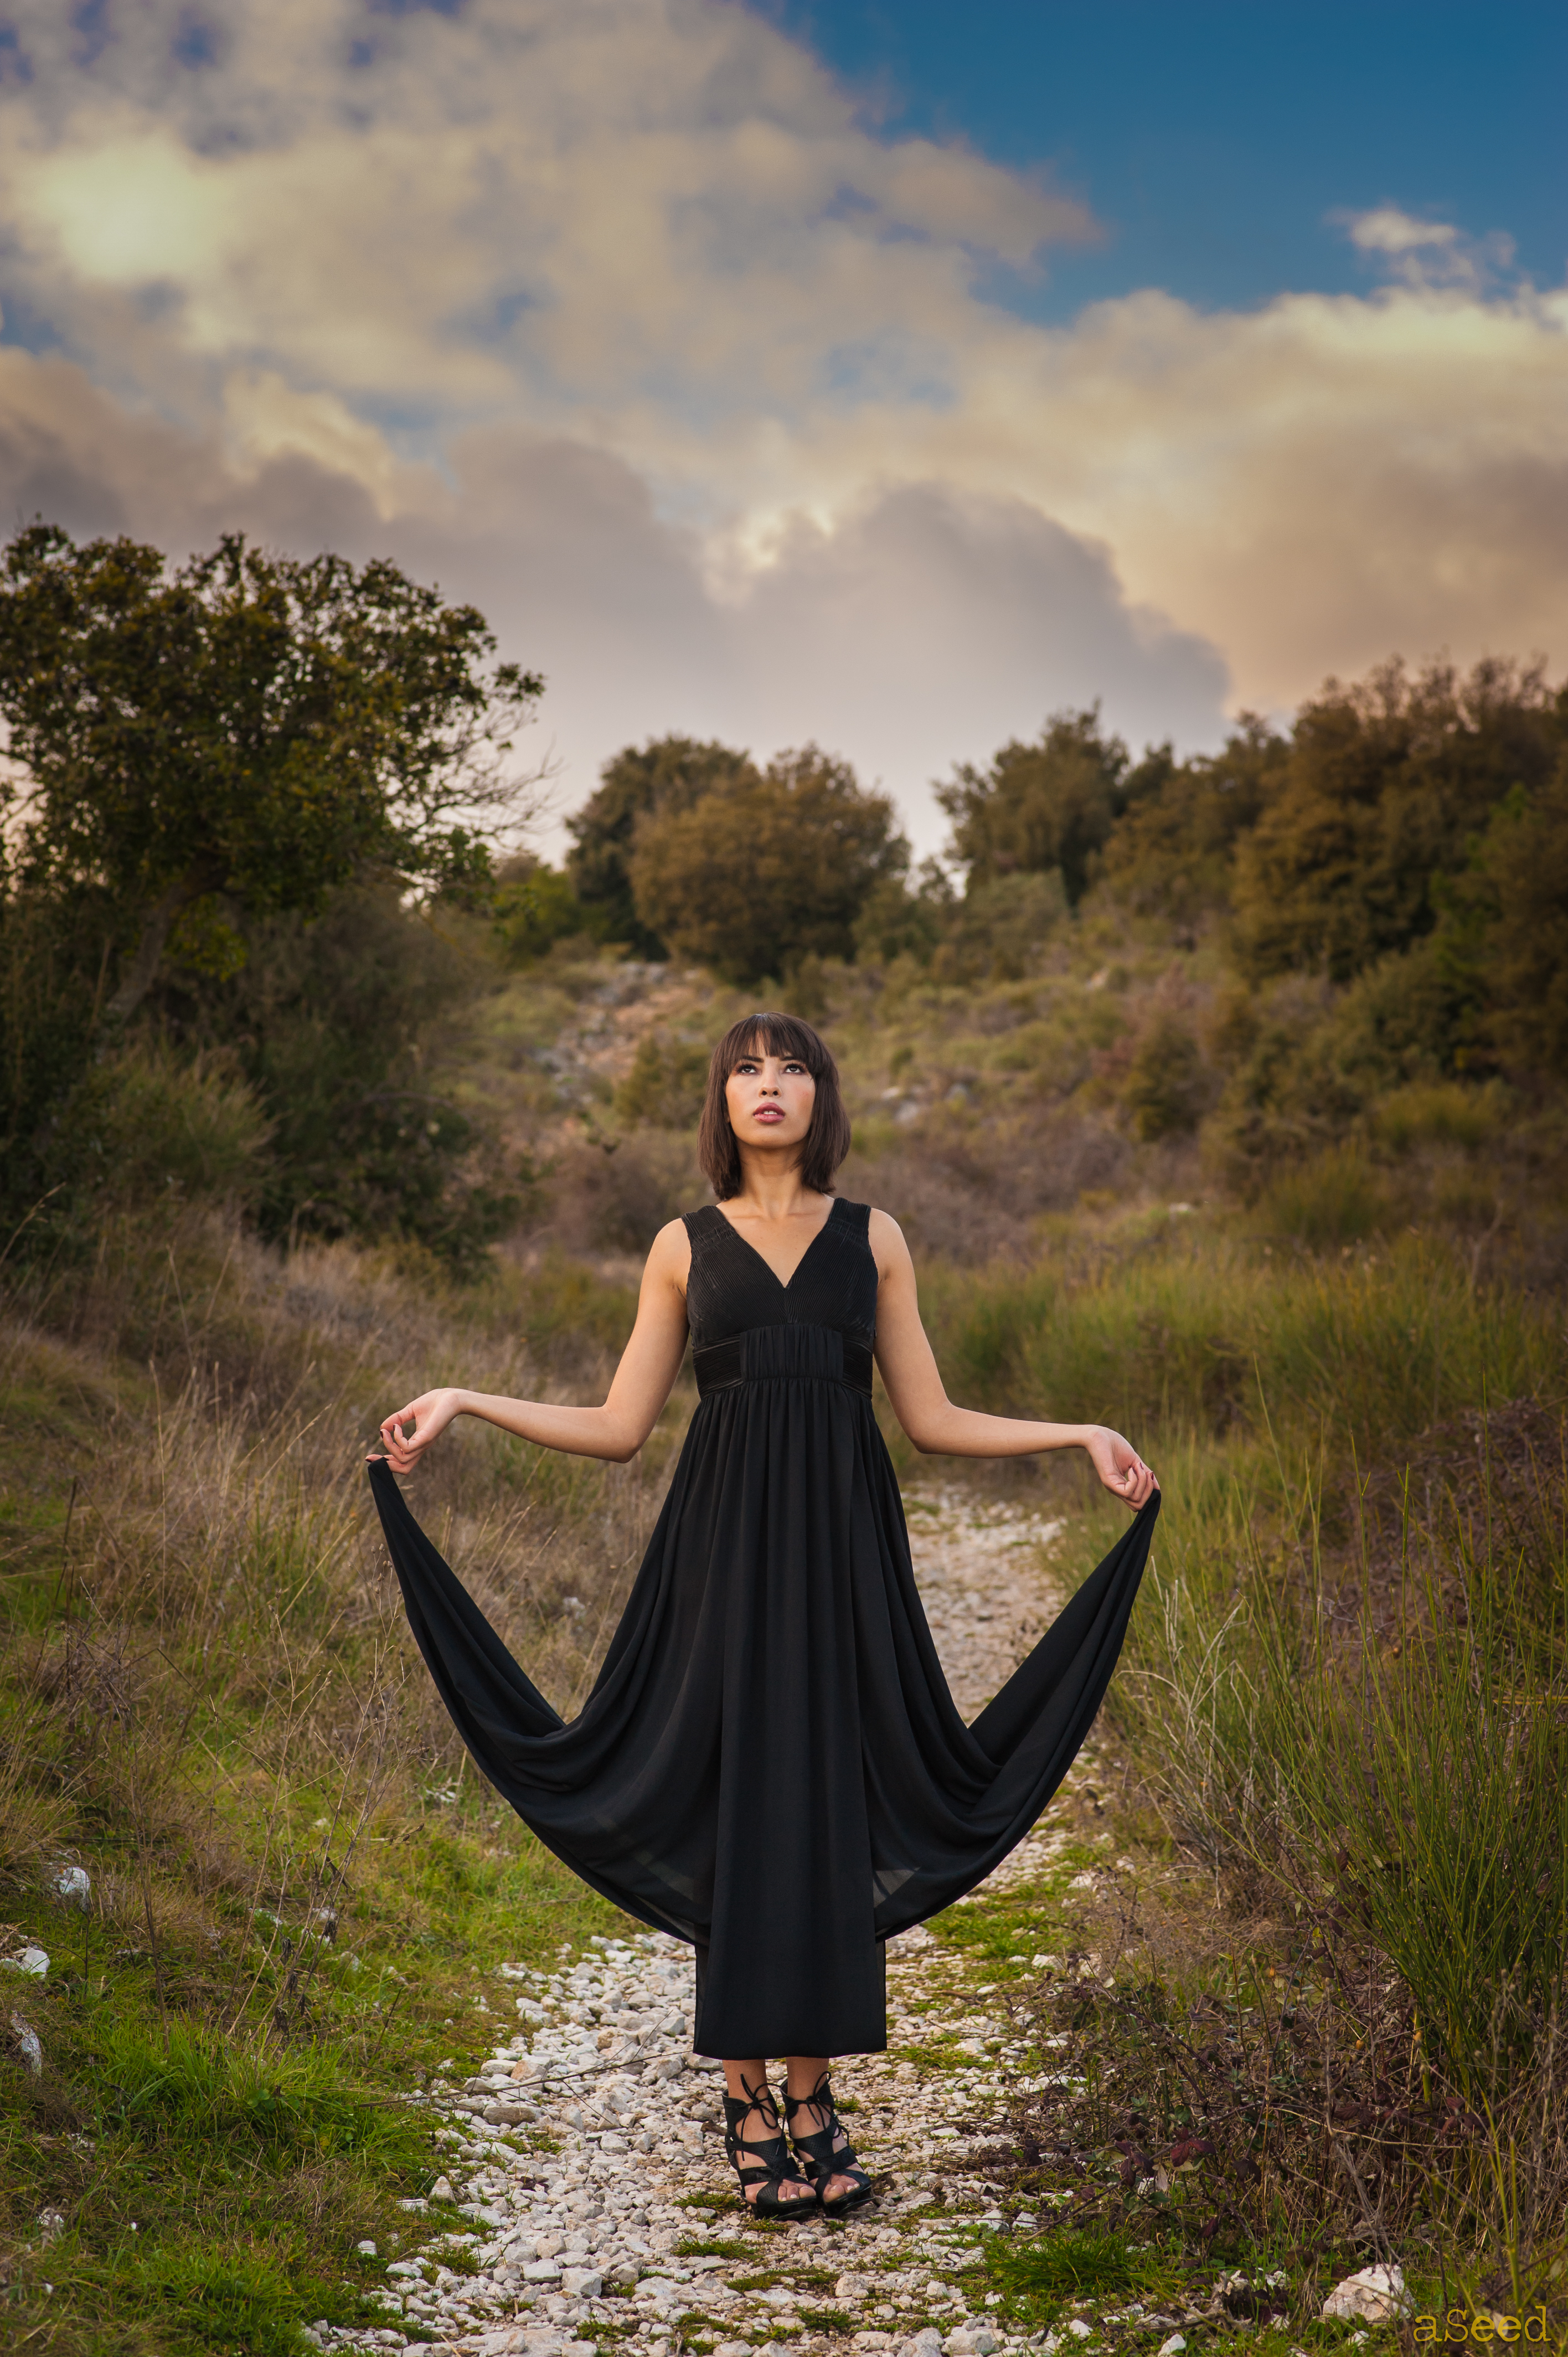 jasmine cooper photographe nice. Black Bedroom Furniture Sets. Home Design Ideas